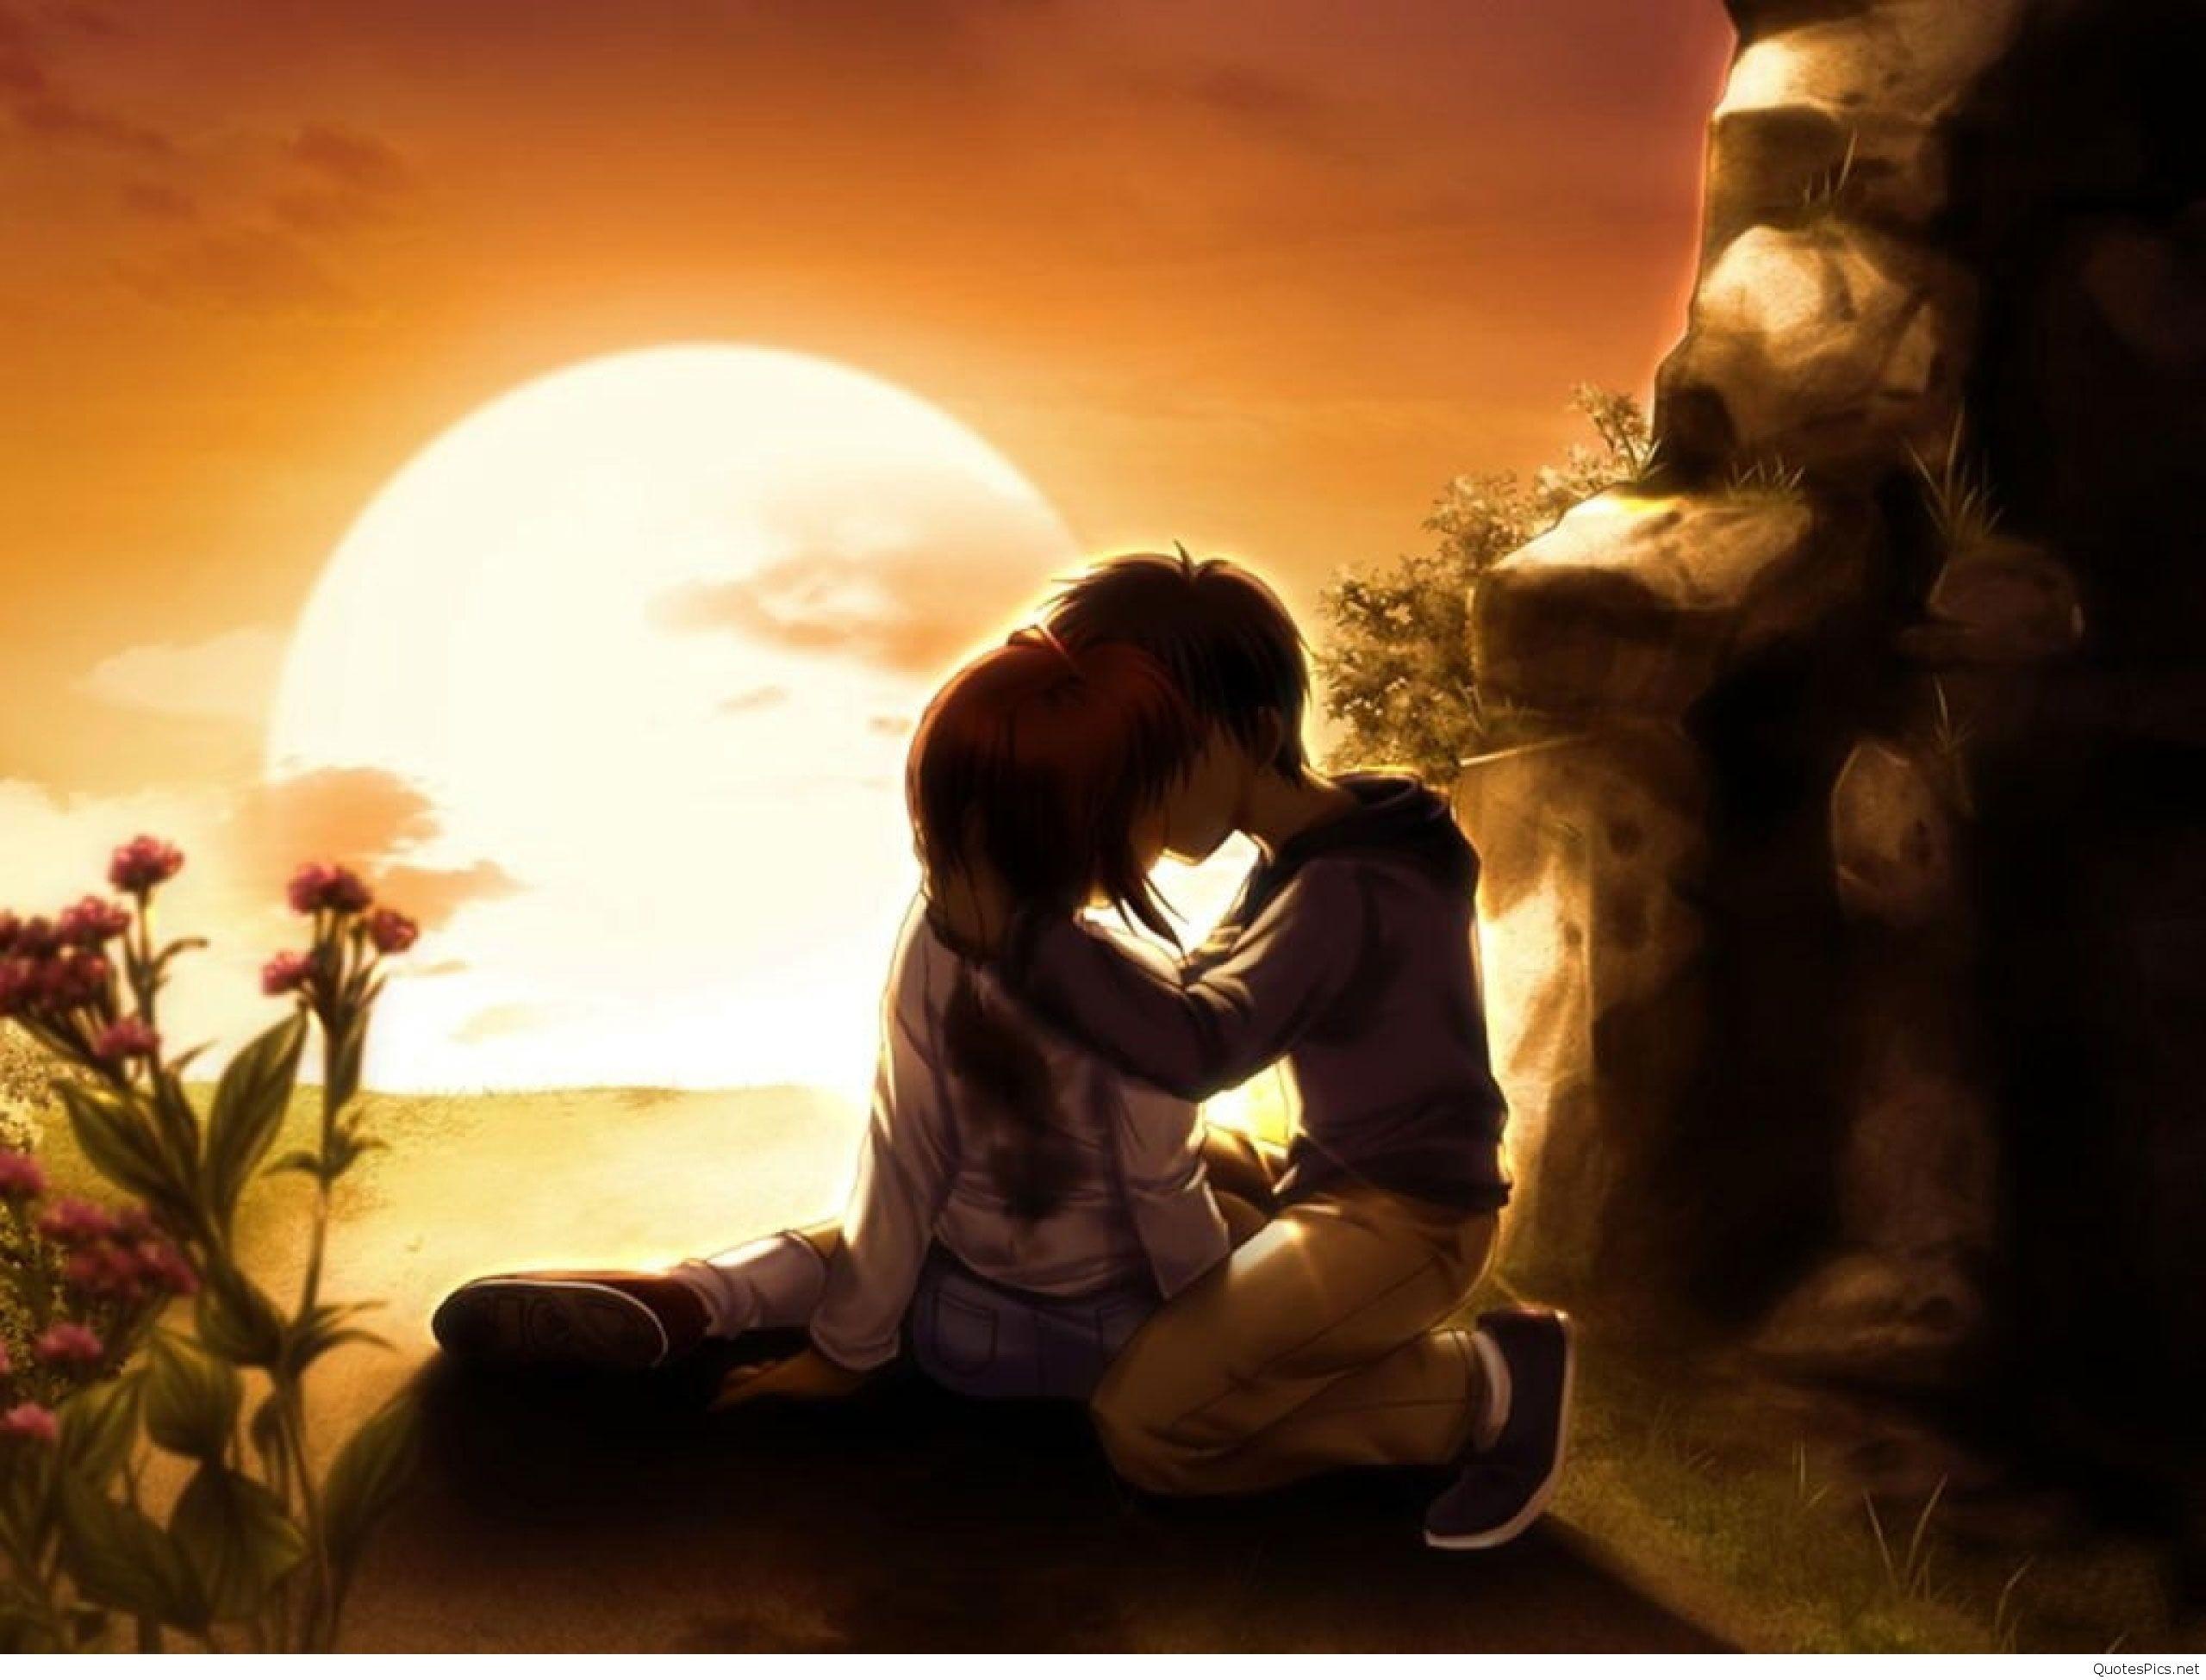 Anime Love Wallpaper Hd 3d gambar ke 10